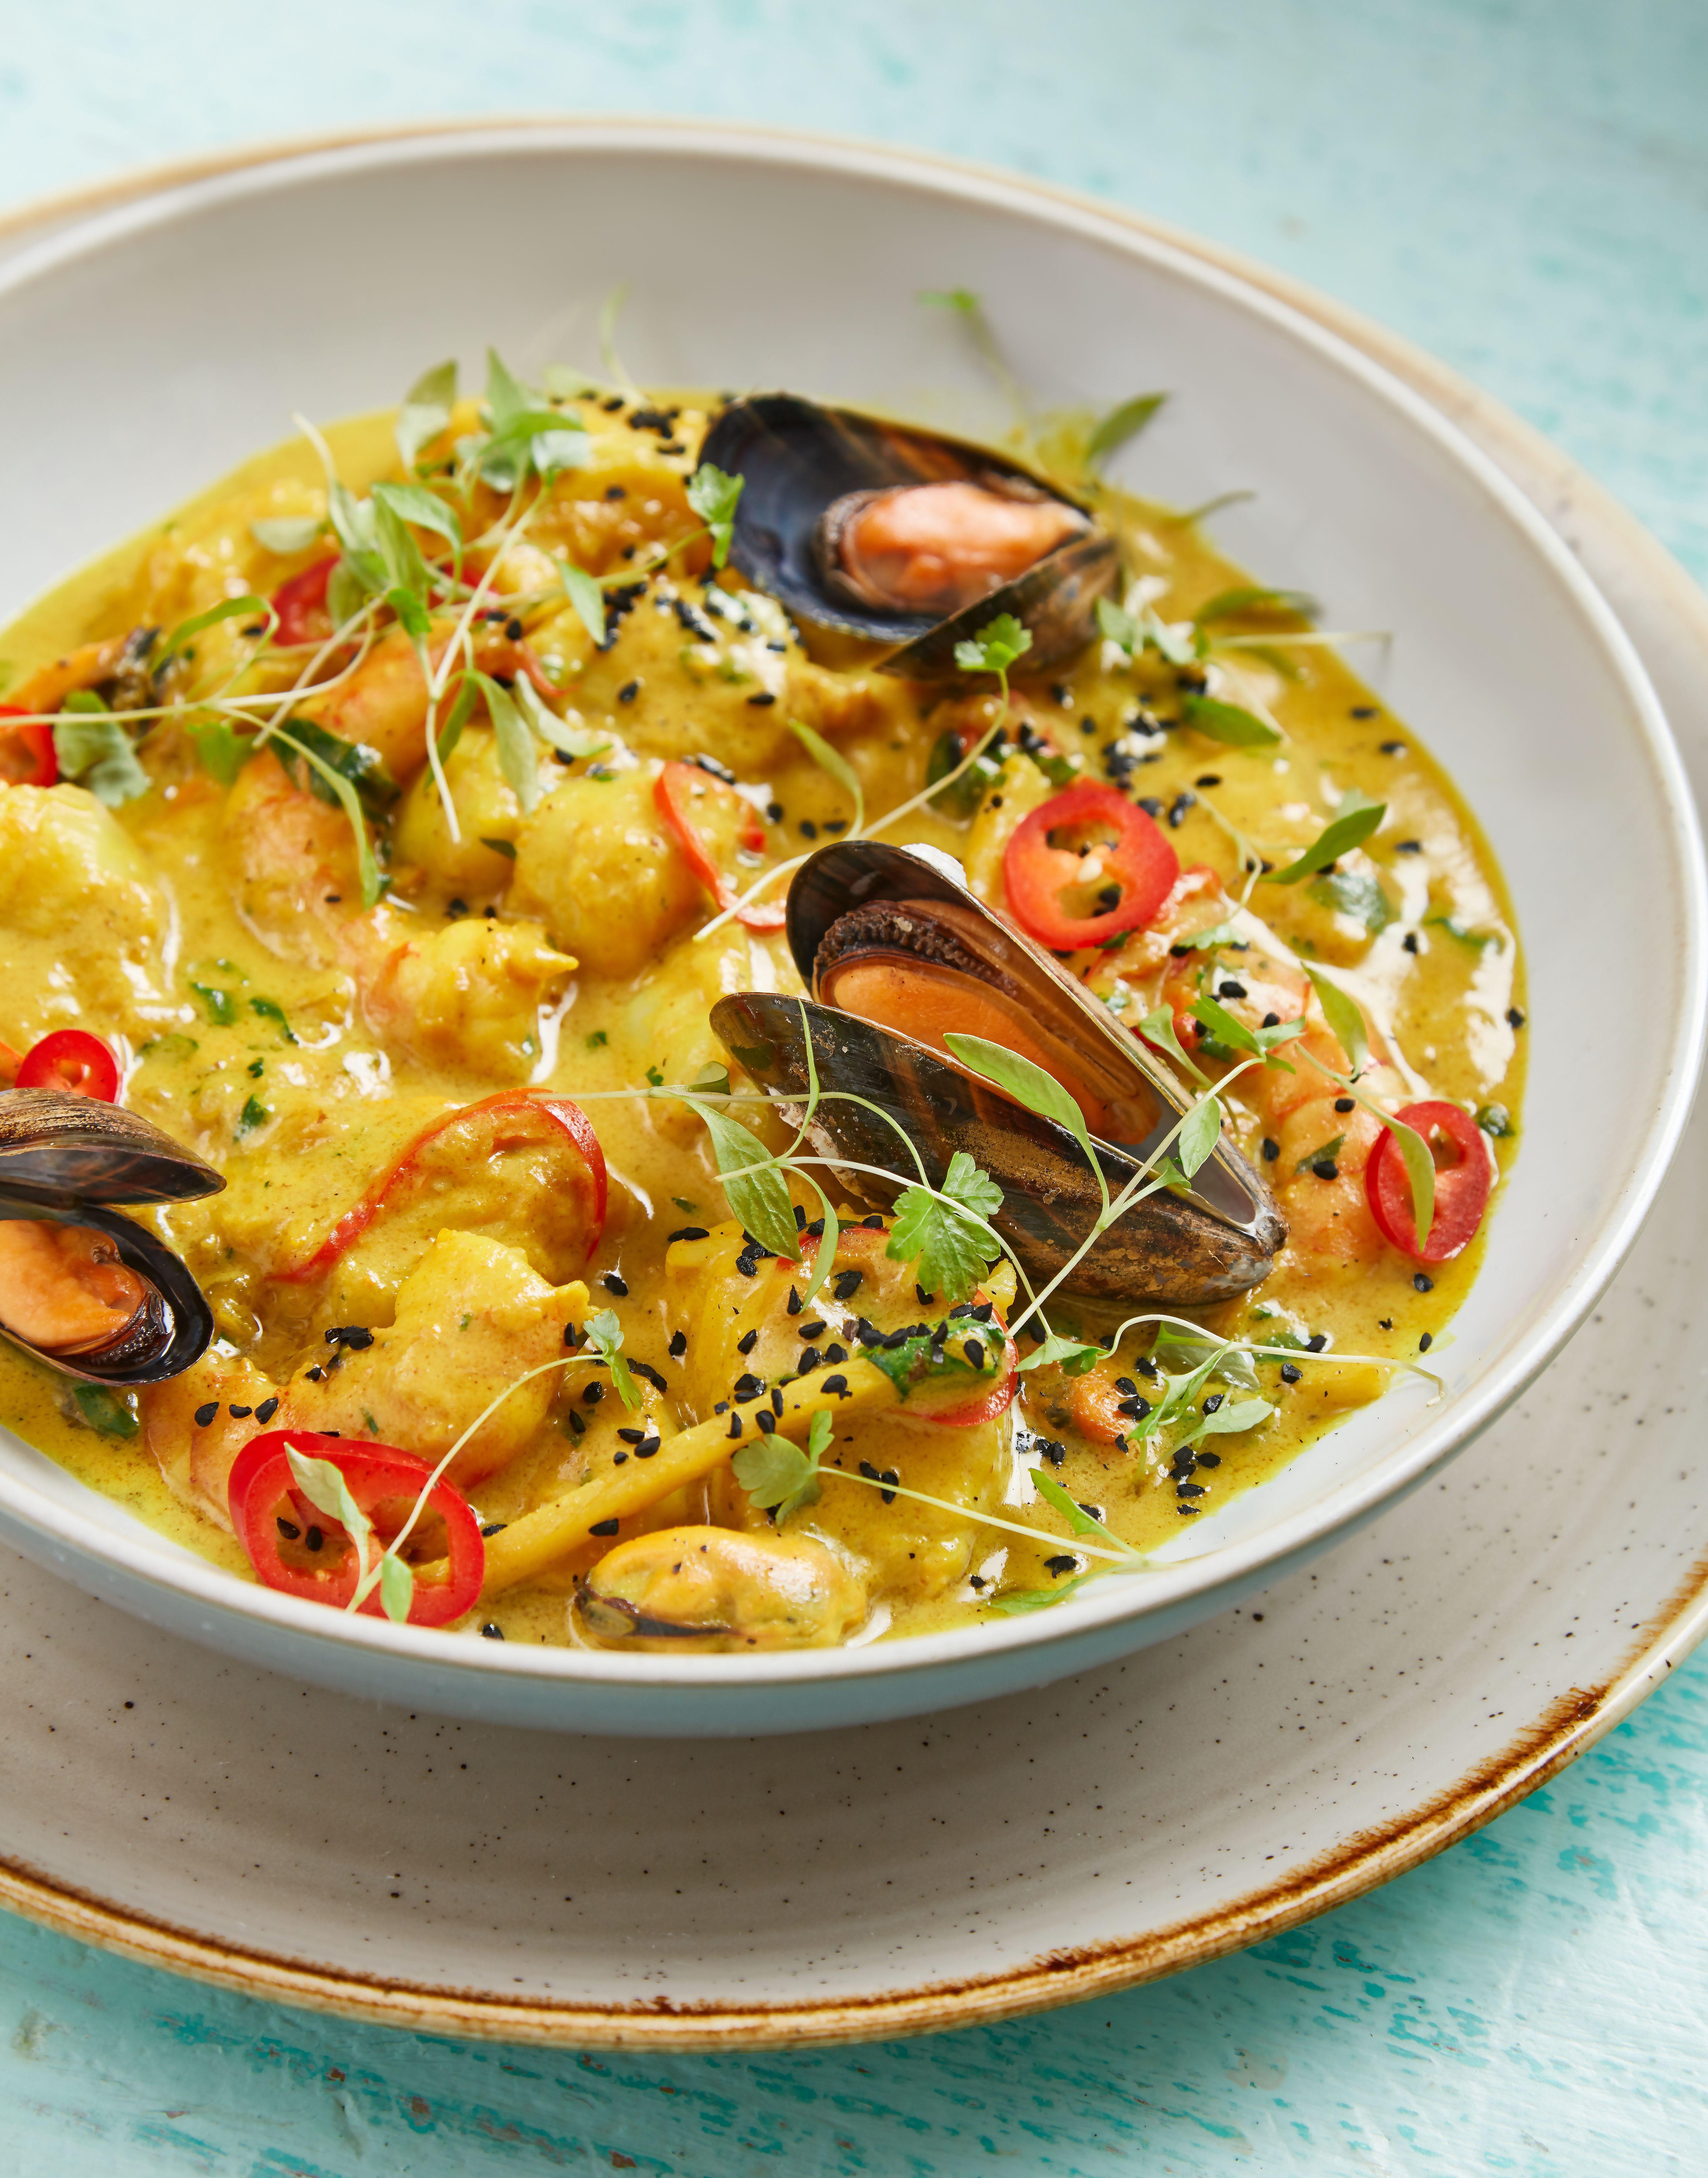 SriLankan Curry  #foodphoto #foodphotography #foodstyling #foodpic #foodlover #foodpics